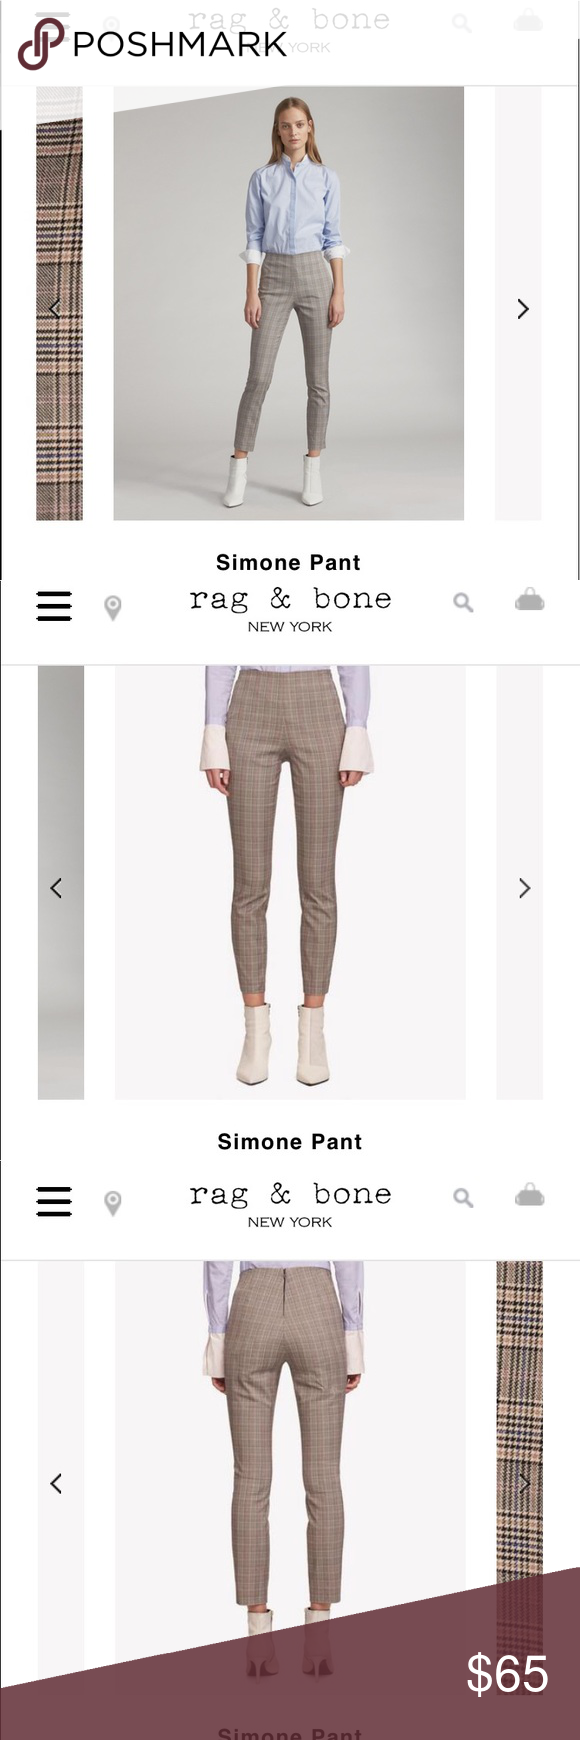 Rag Bone Simone Plaid Pant Plaid Pants Pants Rag Bone